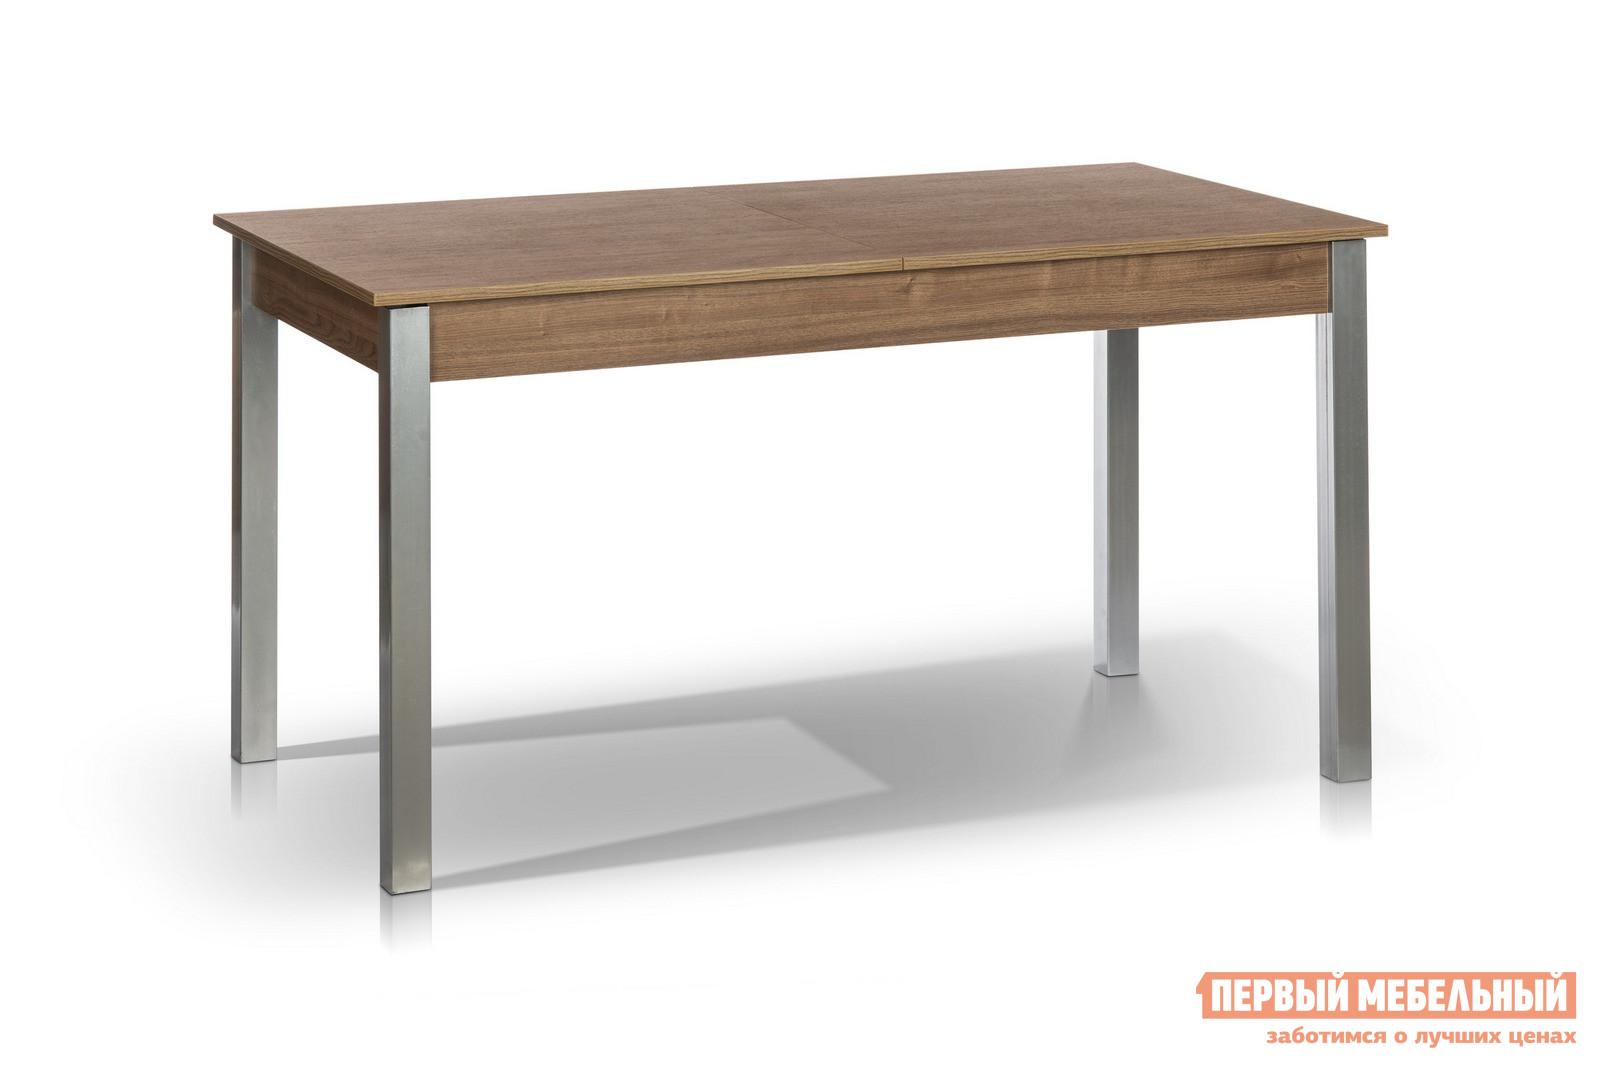 Кухонный стол МегаЭлатон Лугано Каштан минск